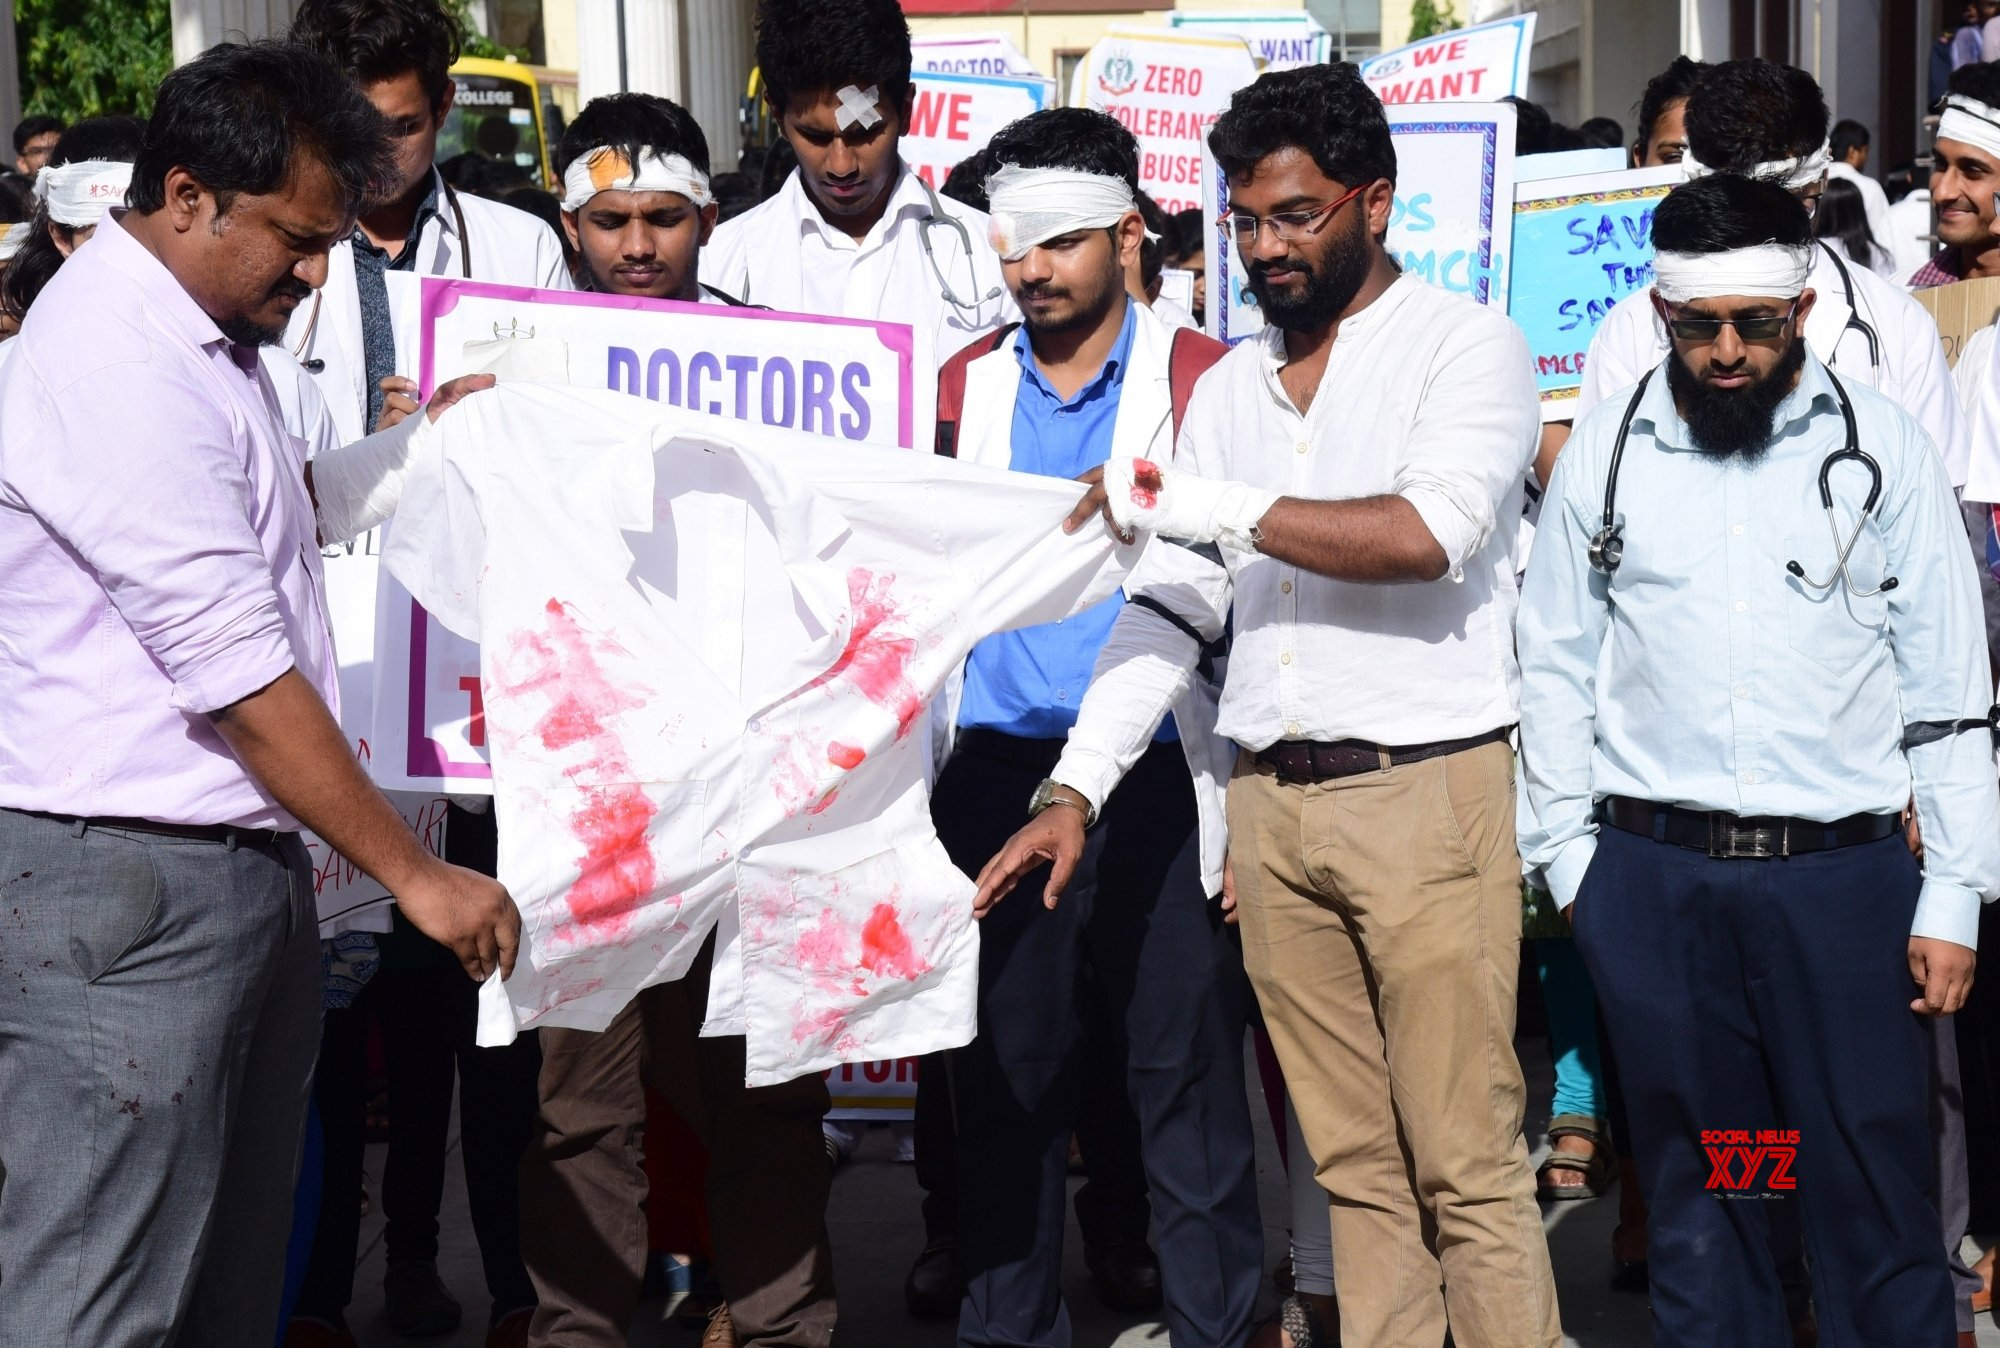 Bengaluru: Karnataka medicos protest against attack on doctors #Gallery